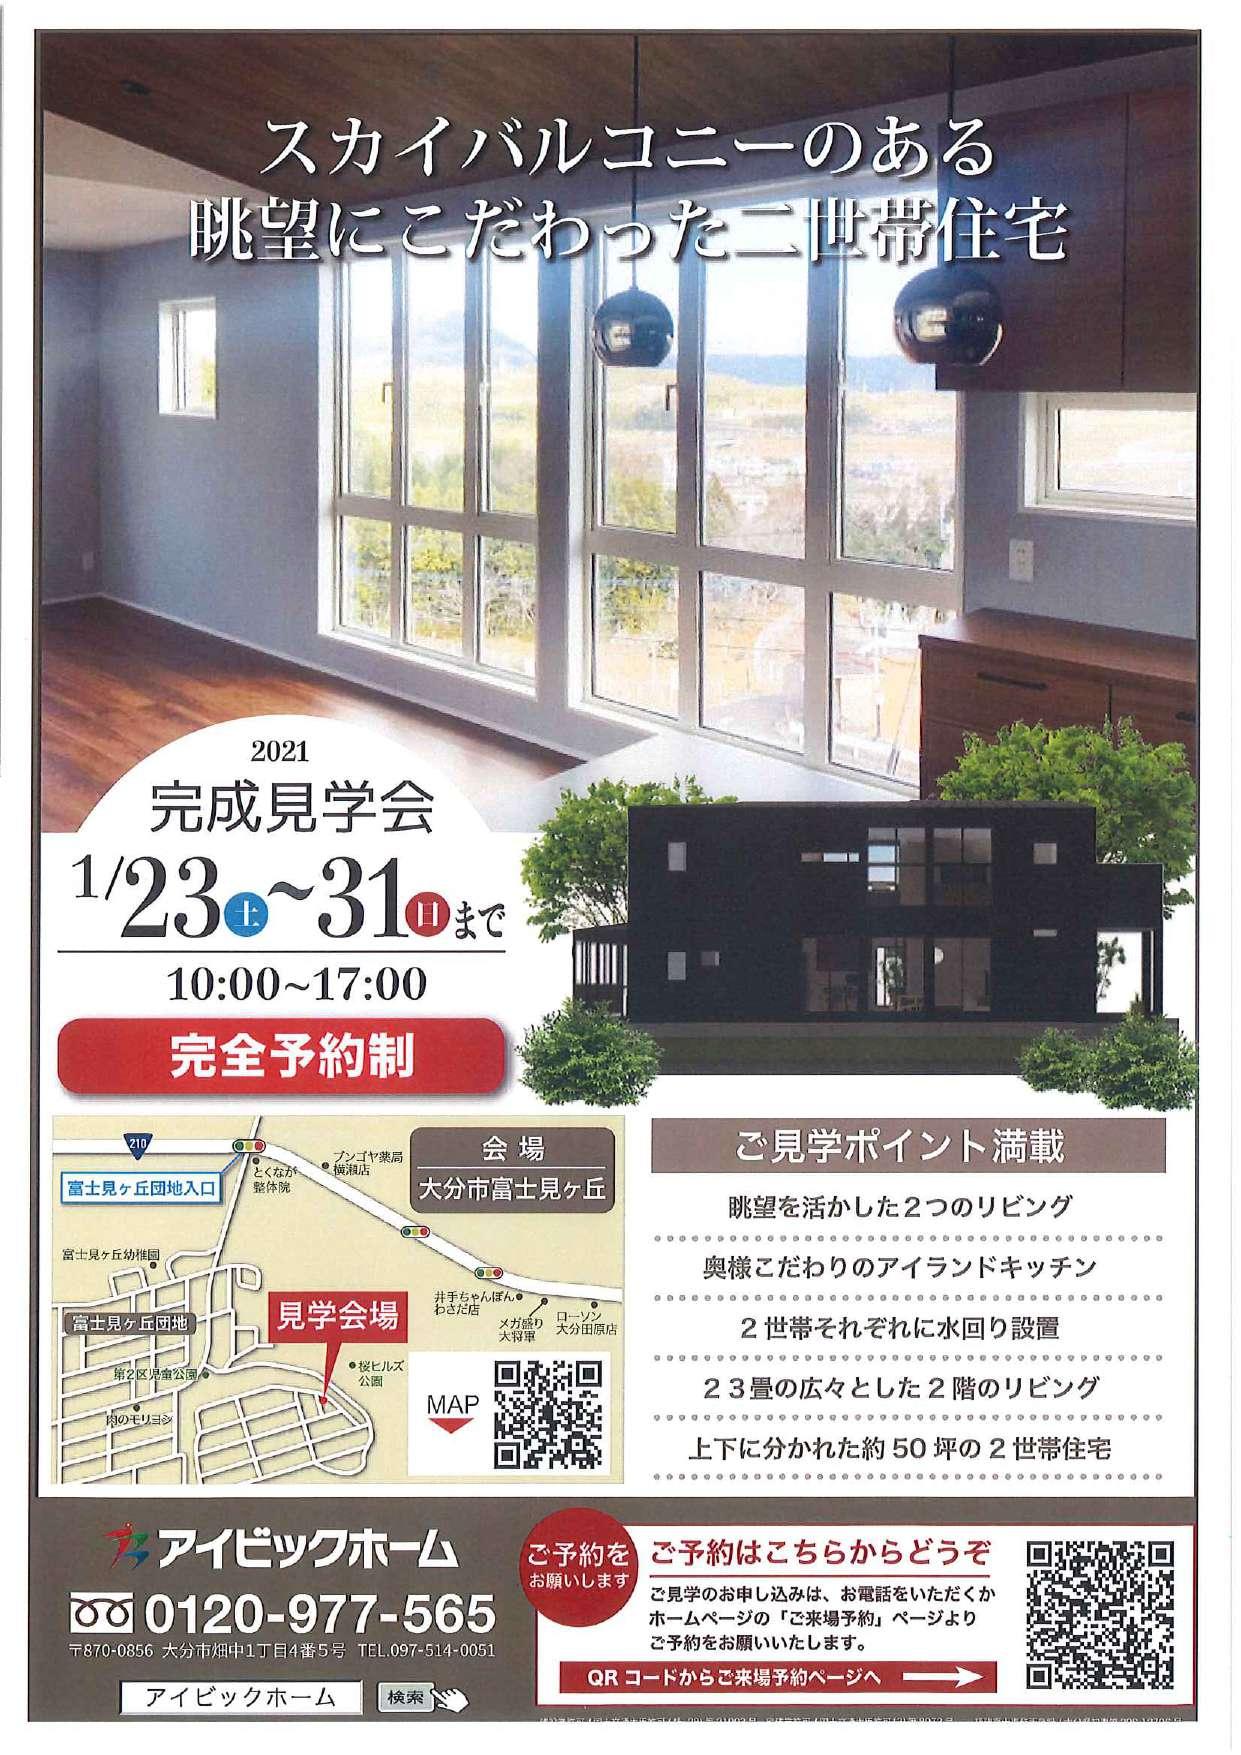 image 富士見が丘で2世帯住宅が見学できます